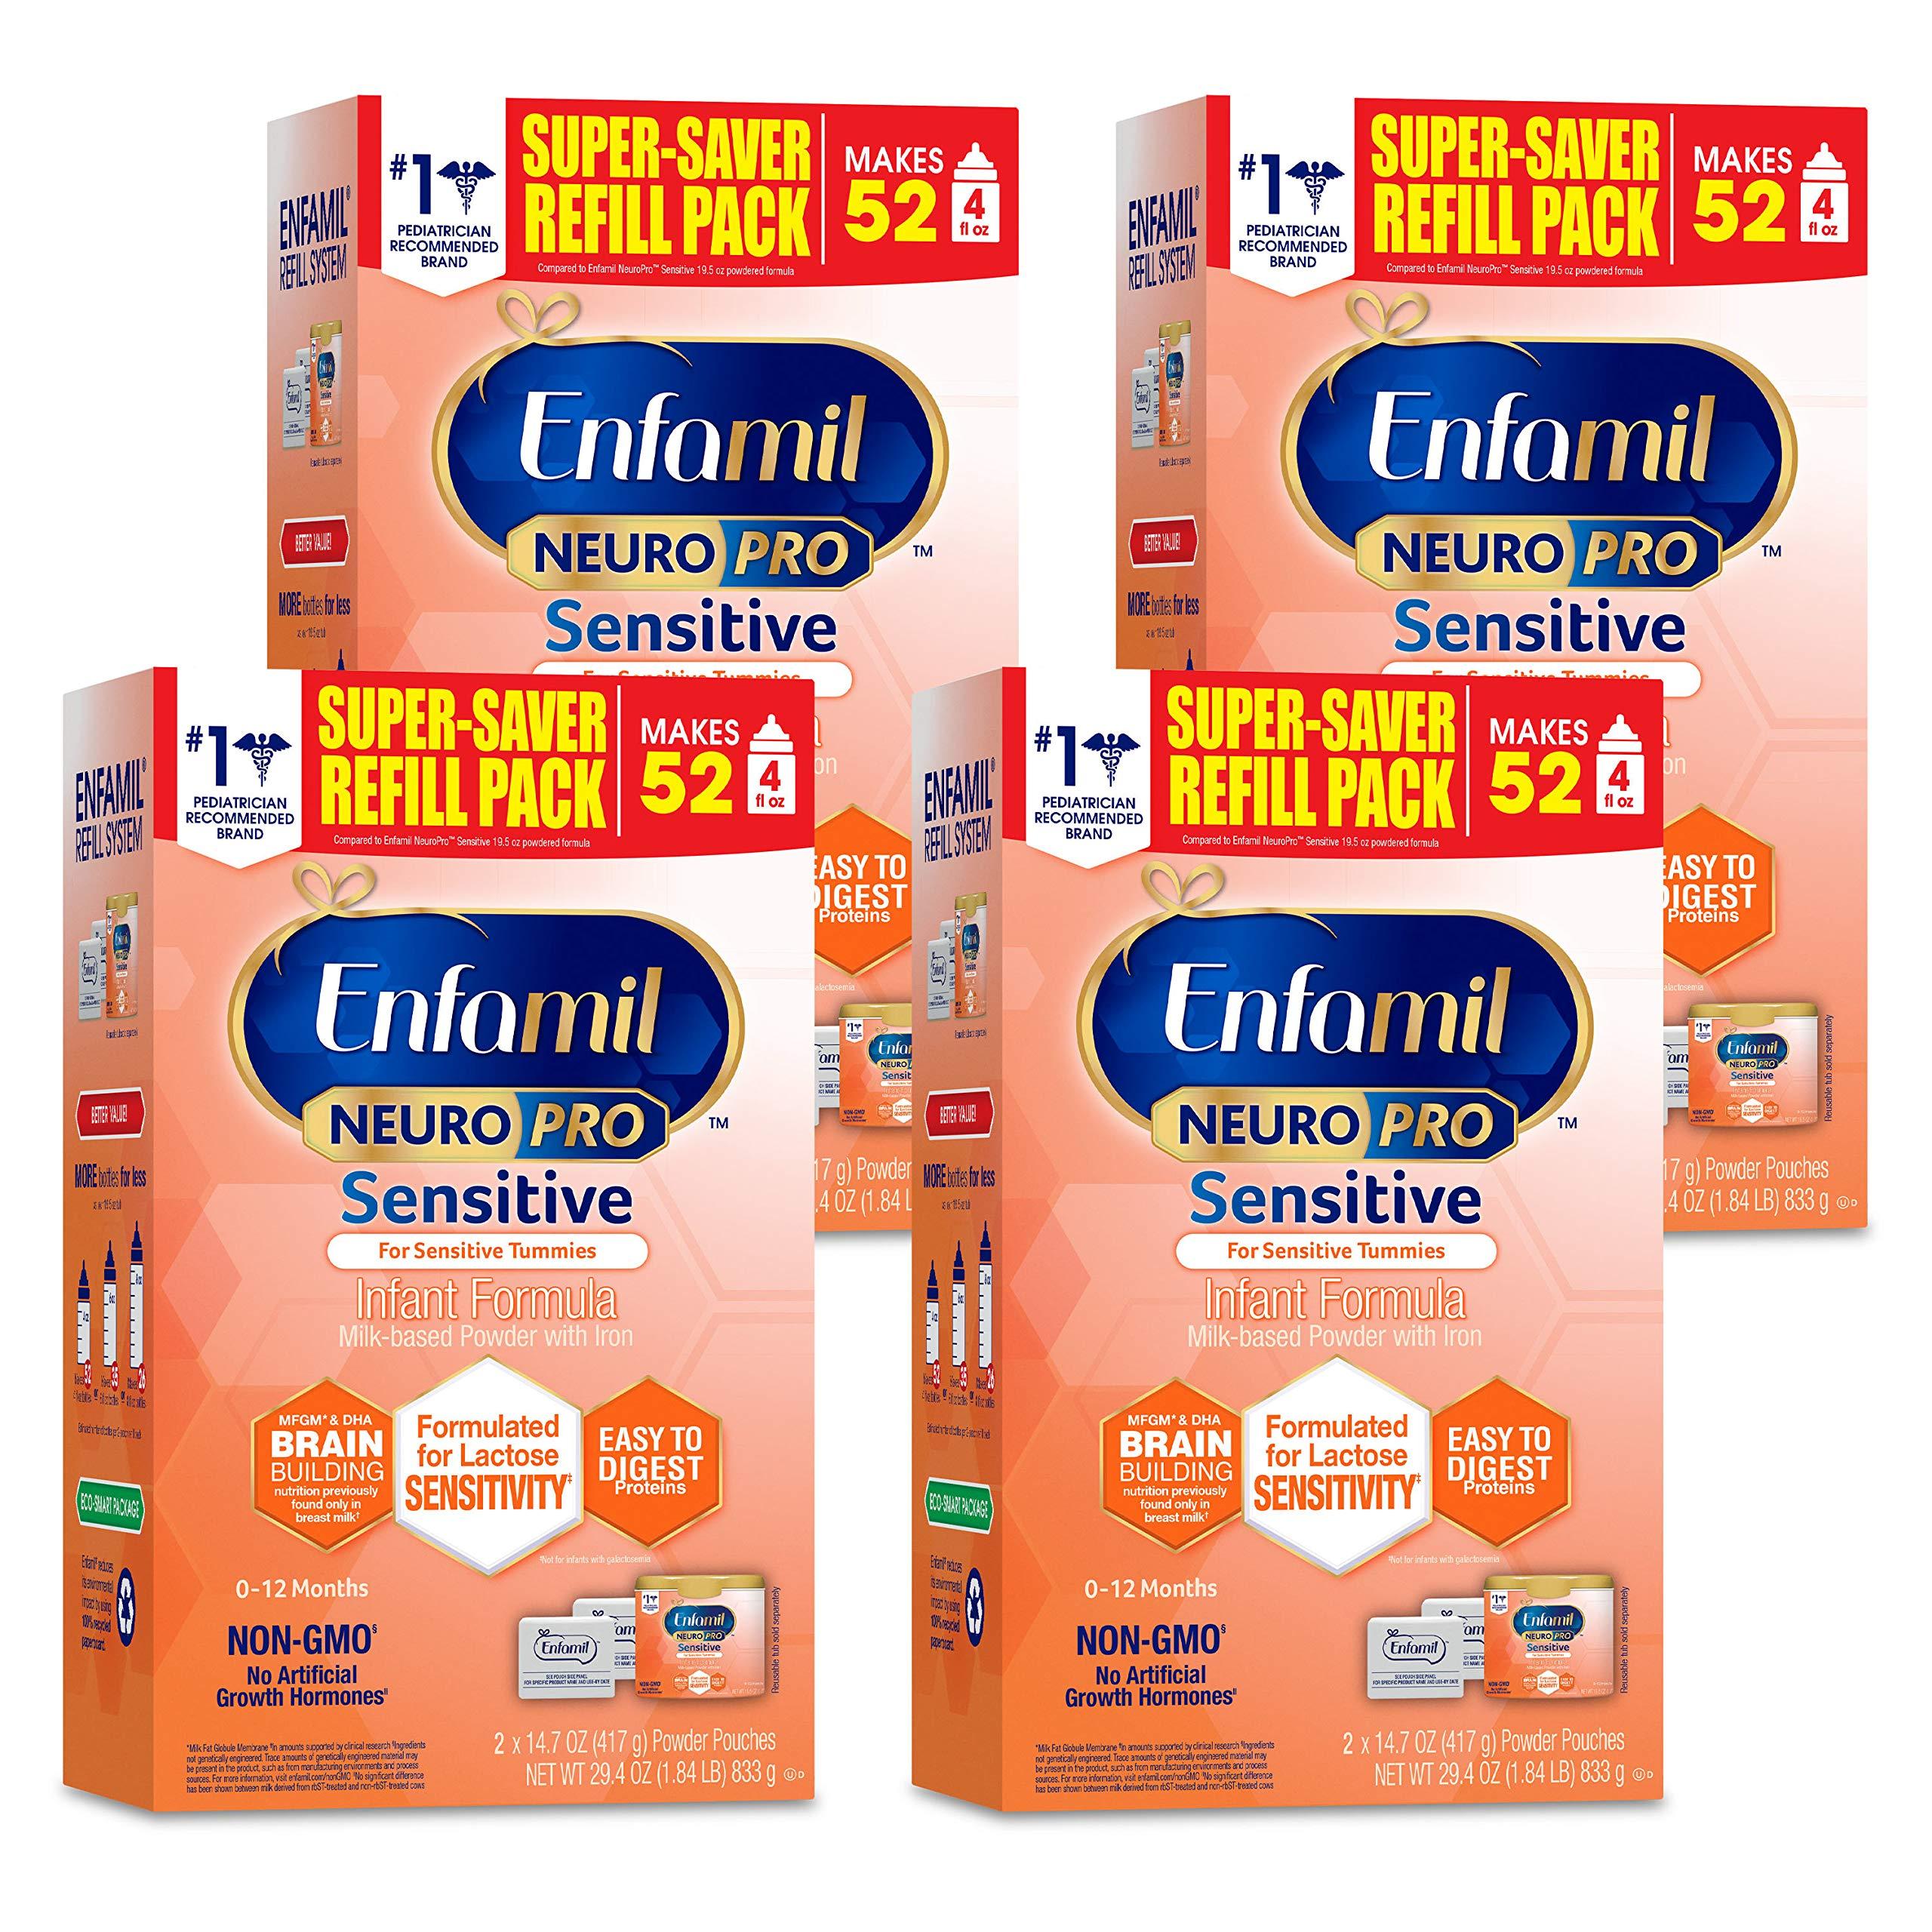 Enfamil NeuroPro Sensitive Baby Formula Gentle Milk Powder Refill, 29.4 Ounce (Pack of 4) - Omega 3 DHA, Probiotics, Immune Support